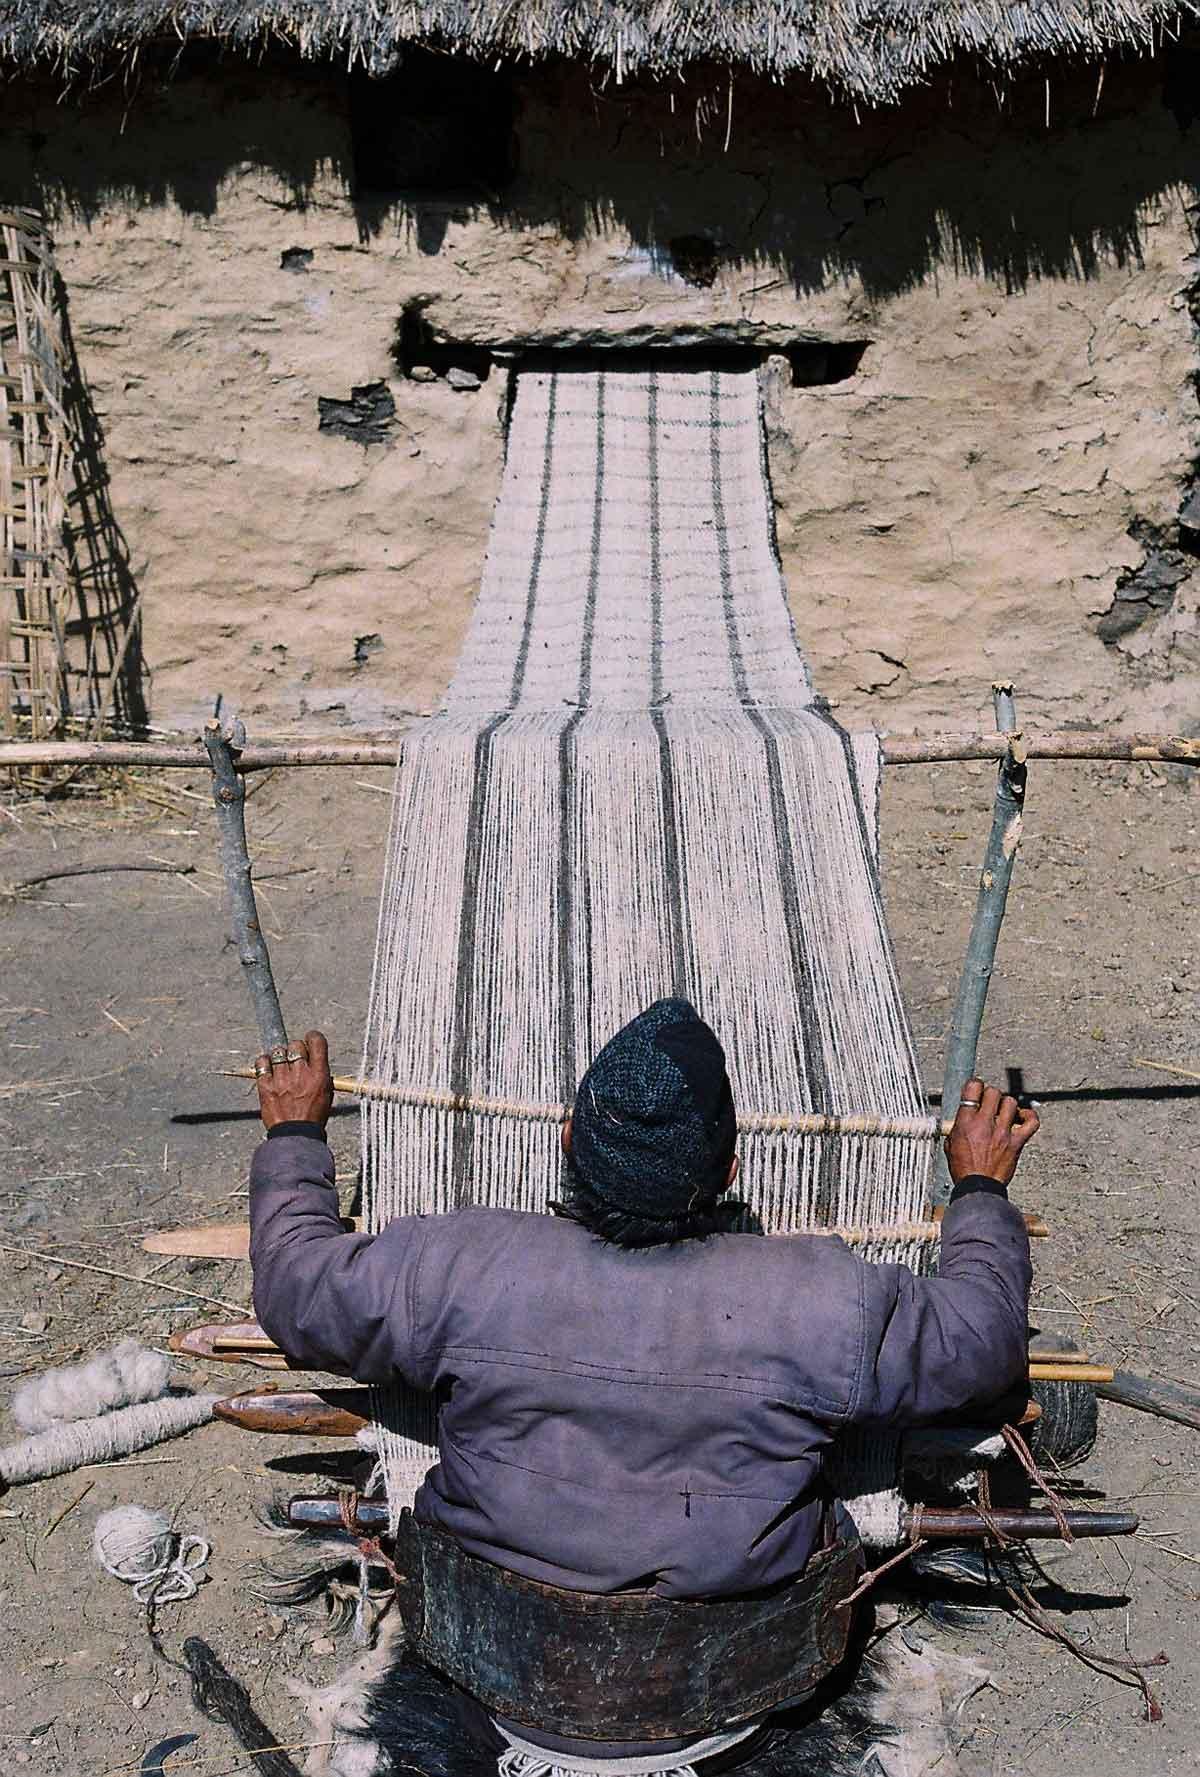 alternative textiles, brand, ethical, ethical fashion, fair fashion, fashion and craftmanship, Fashion Future, hemp, hemp textiles, hemper, luxury fashion, Nepal, preserving traditions through fashion, supply chain, sustainable fashion, Sustainable luxury, textiles, transparent, value chain, weaving